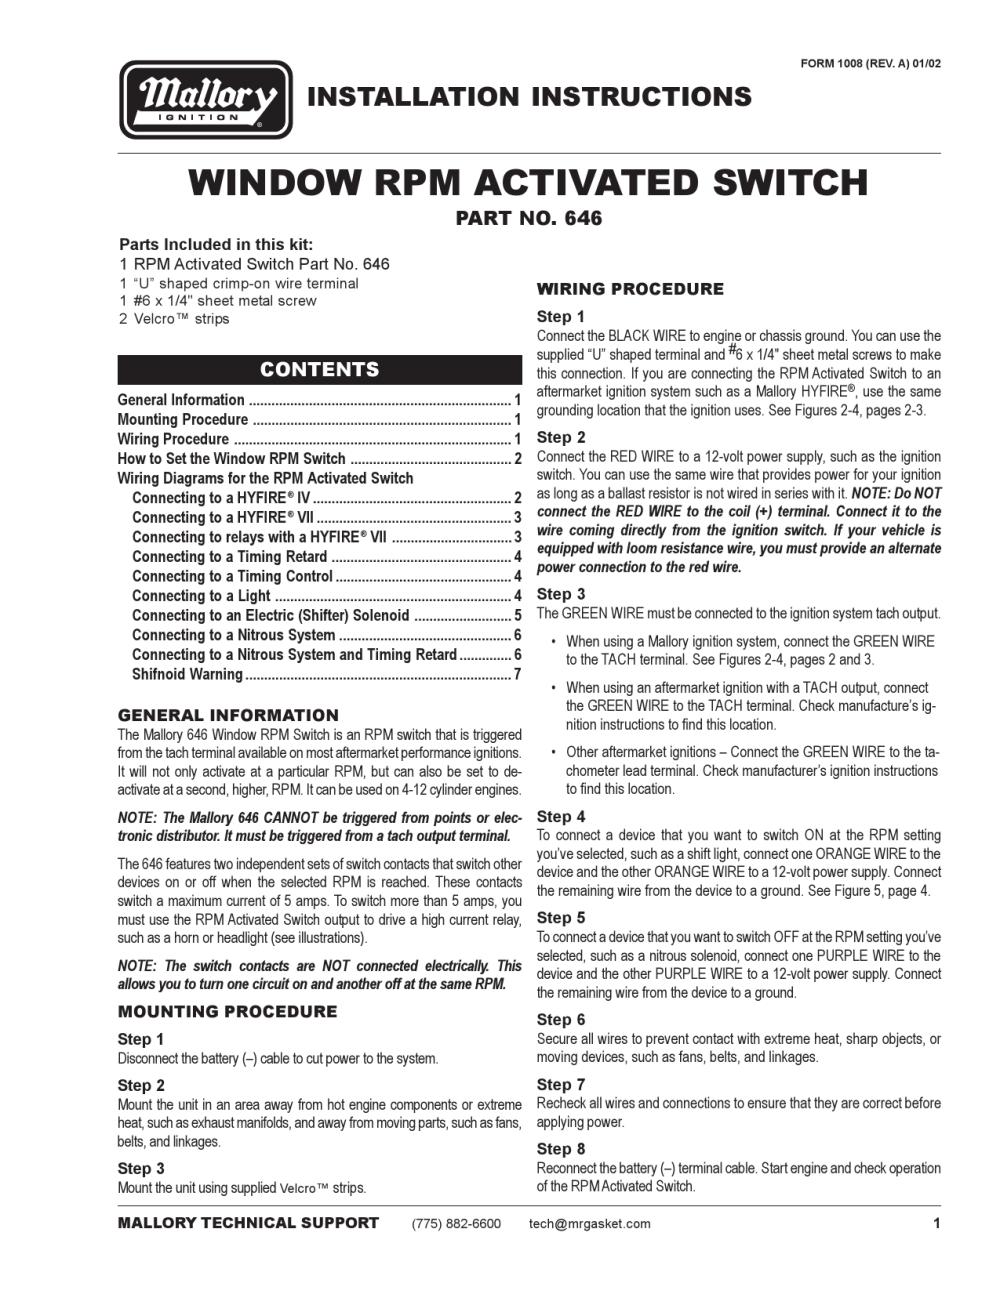 medium resolution of shifnoid wiring diagram